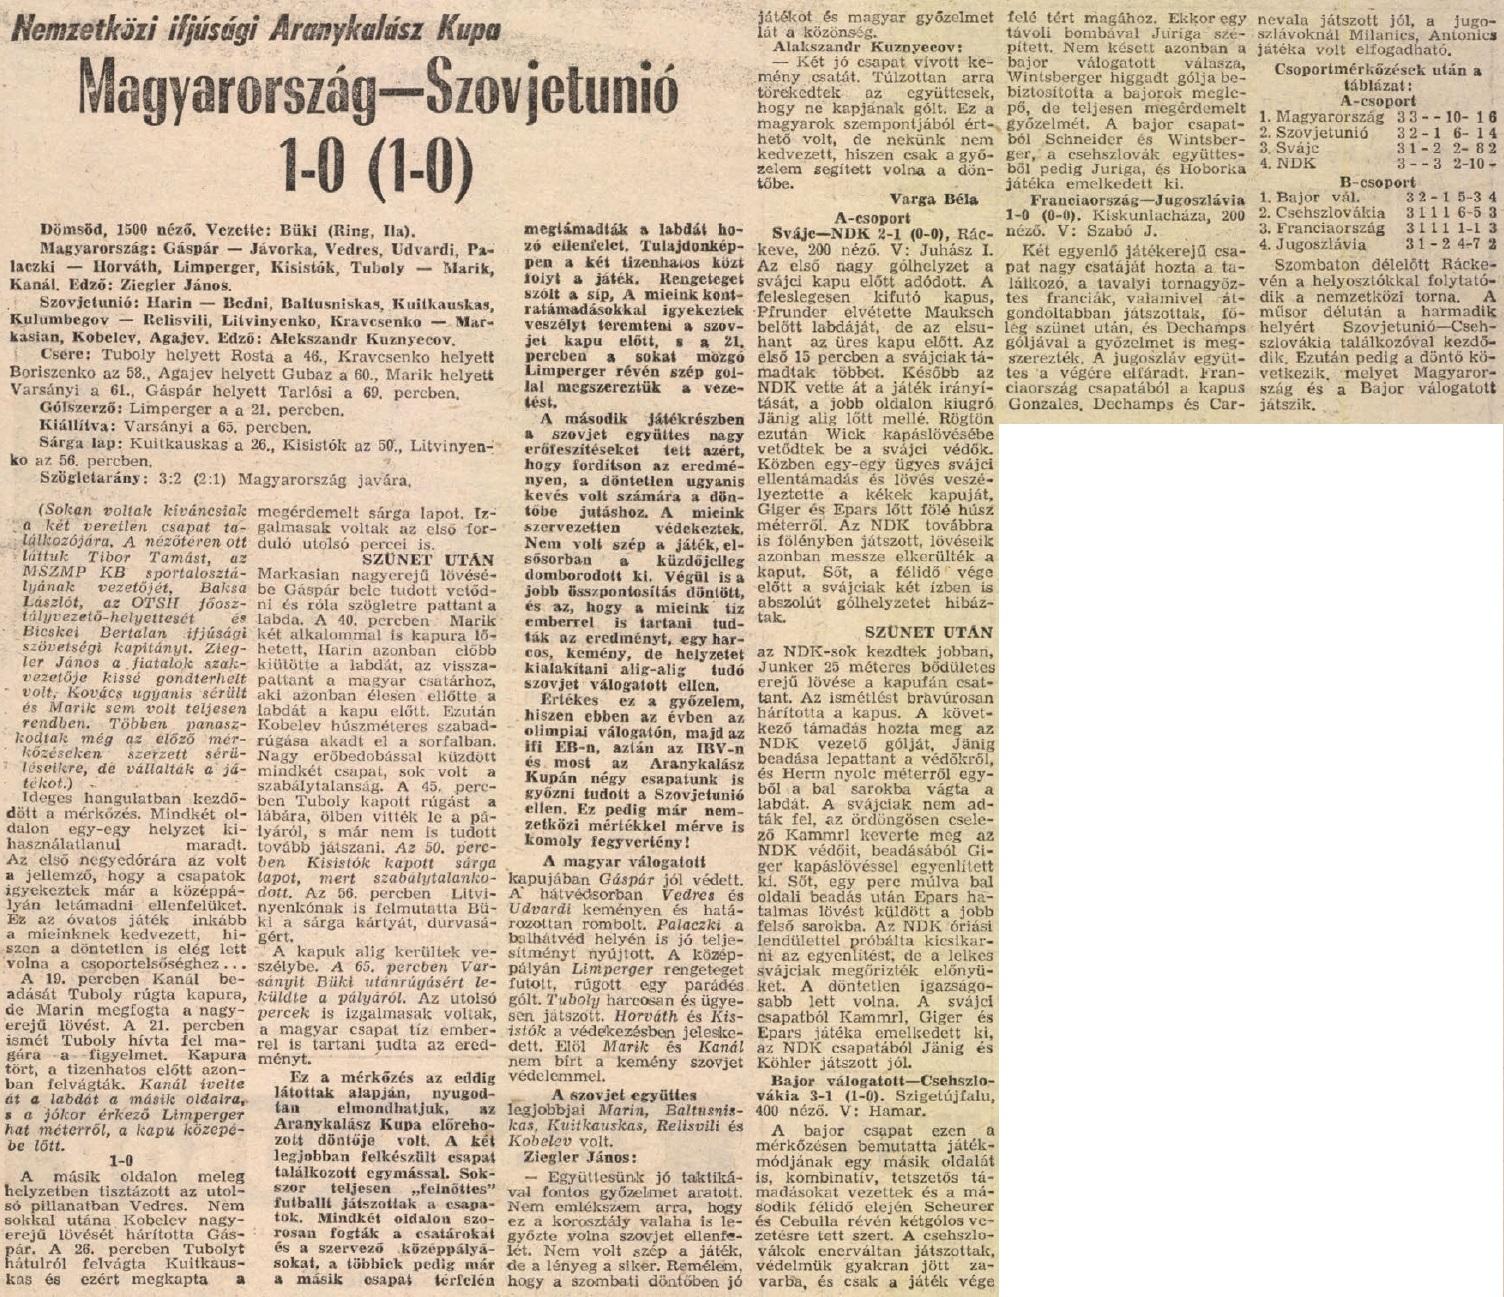 idokapszula_nb_i_1983_84_tavaszi_zaras_tabellaparade_aranykalasz_kupa_magyarorszag_szovjetunio.jpg